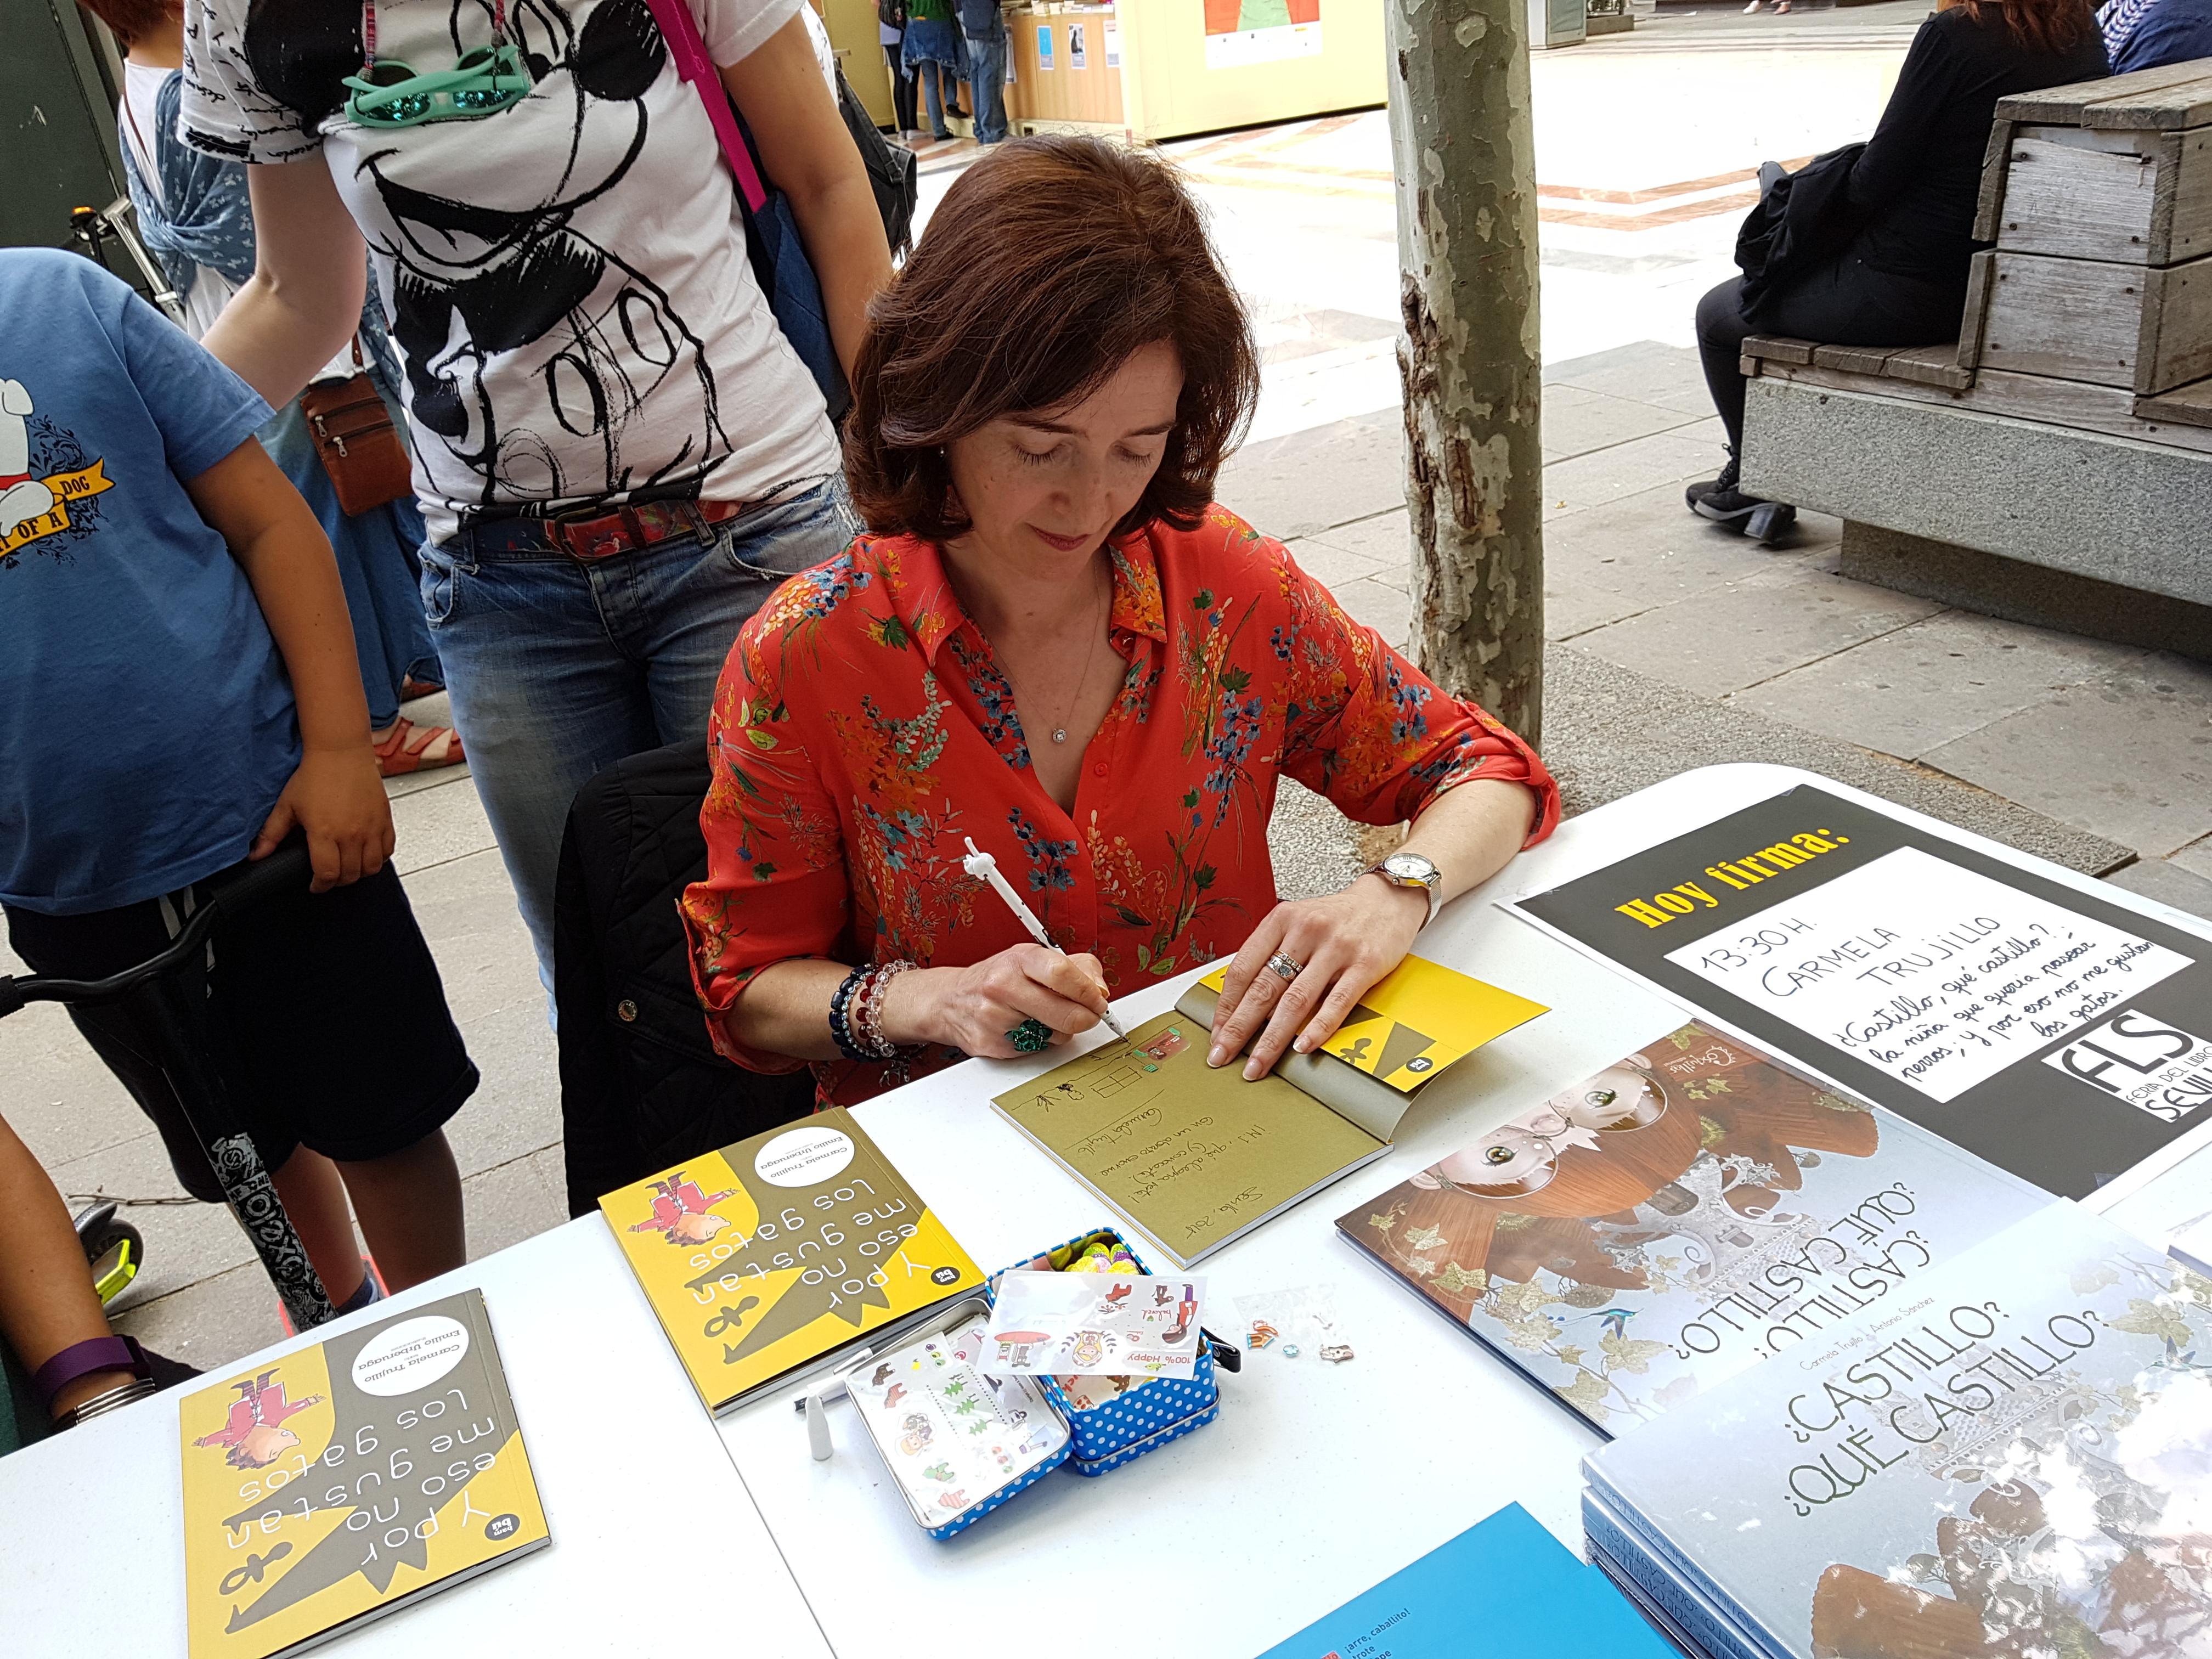 Feria del Libro 2 (20180512_141545.jpg)